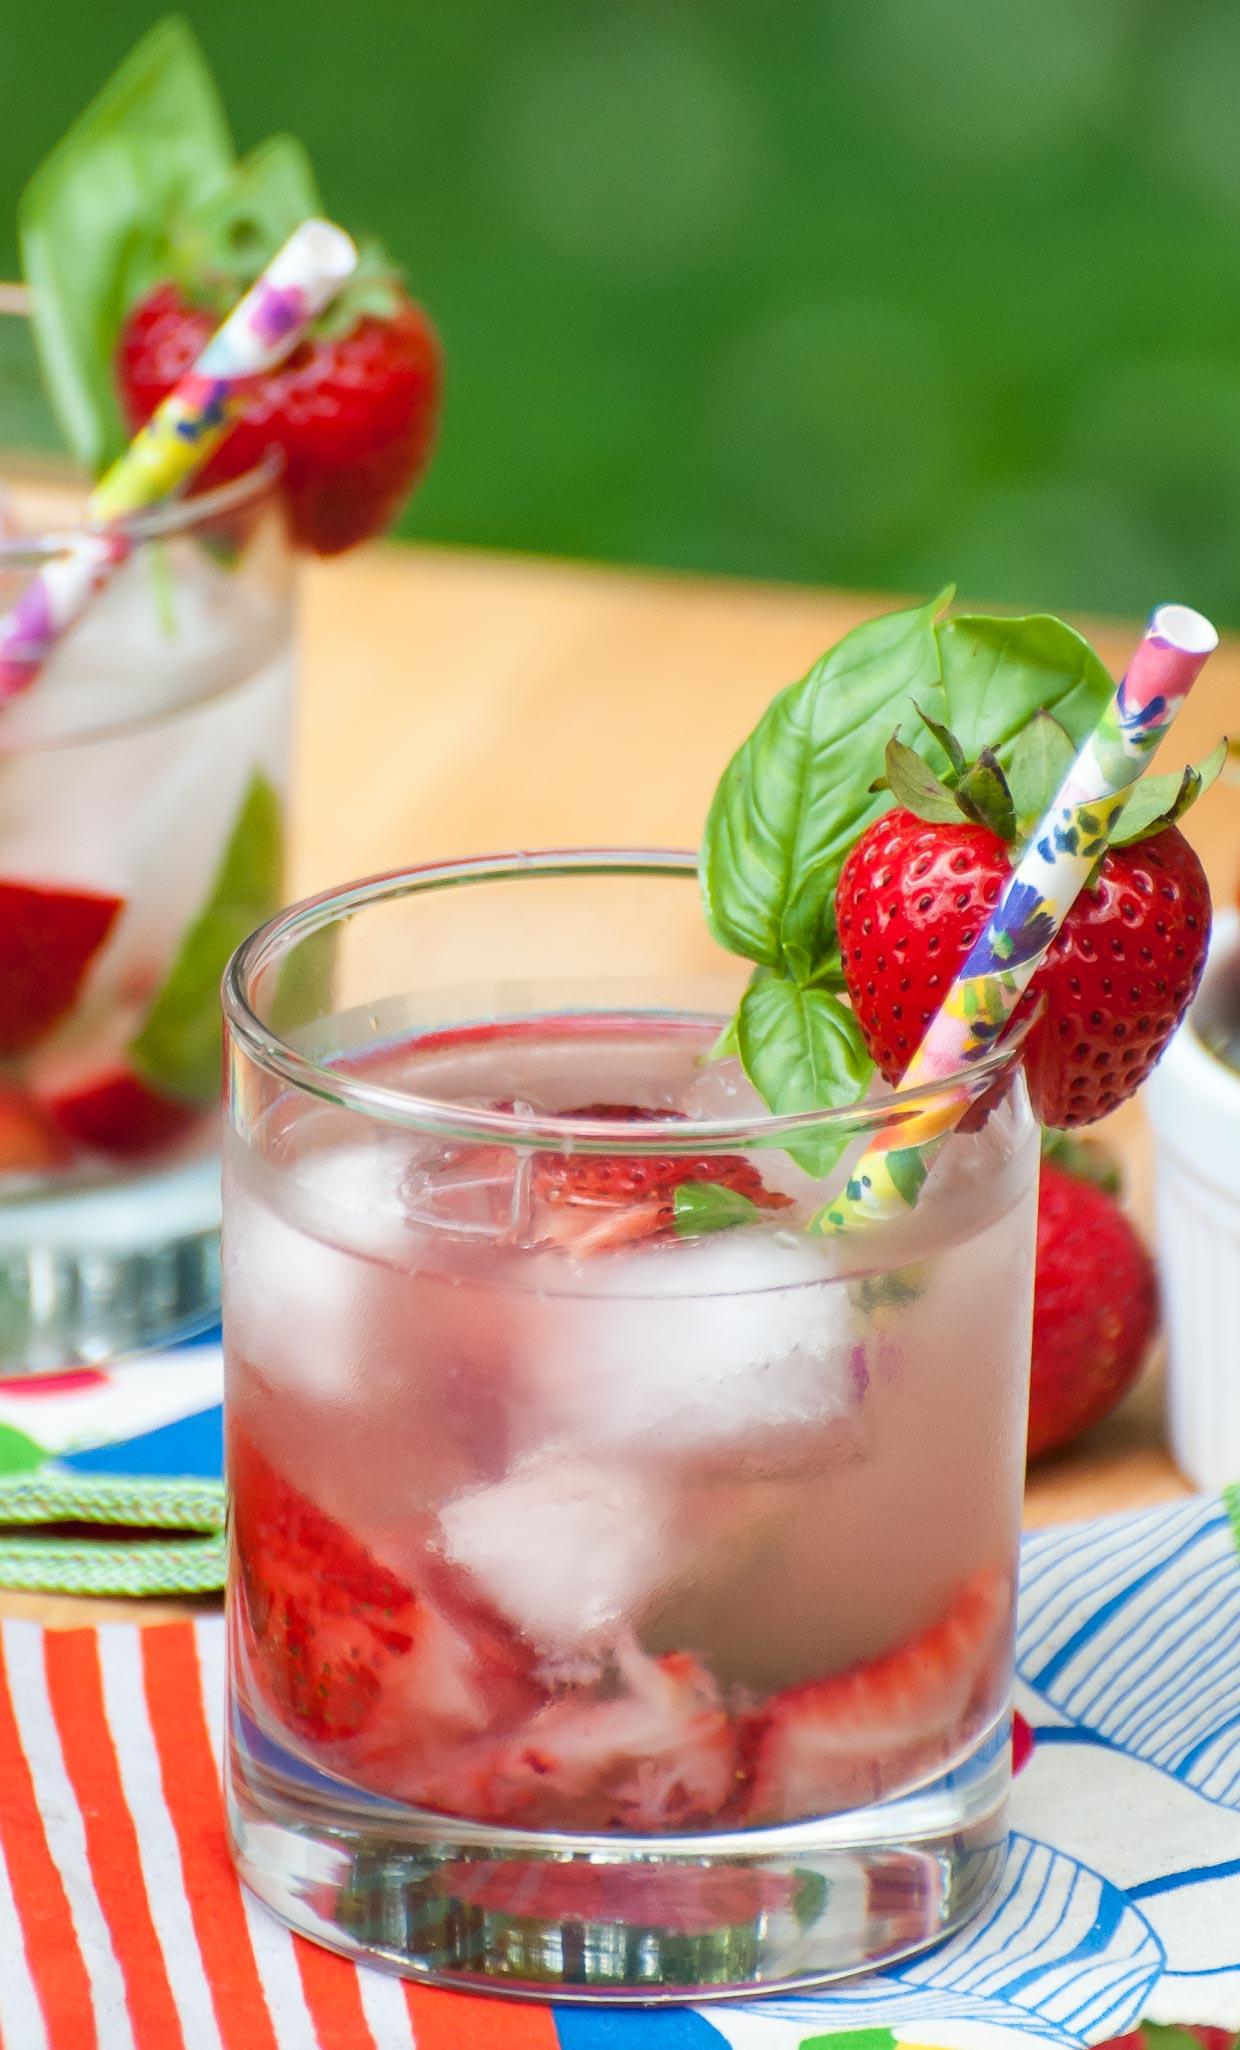 This Strawberry Basil Caipirinha cocktail tastes like Summer in a glass!